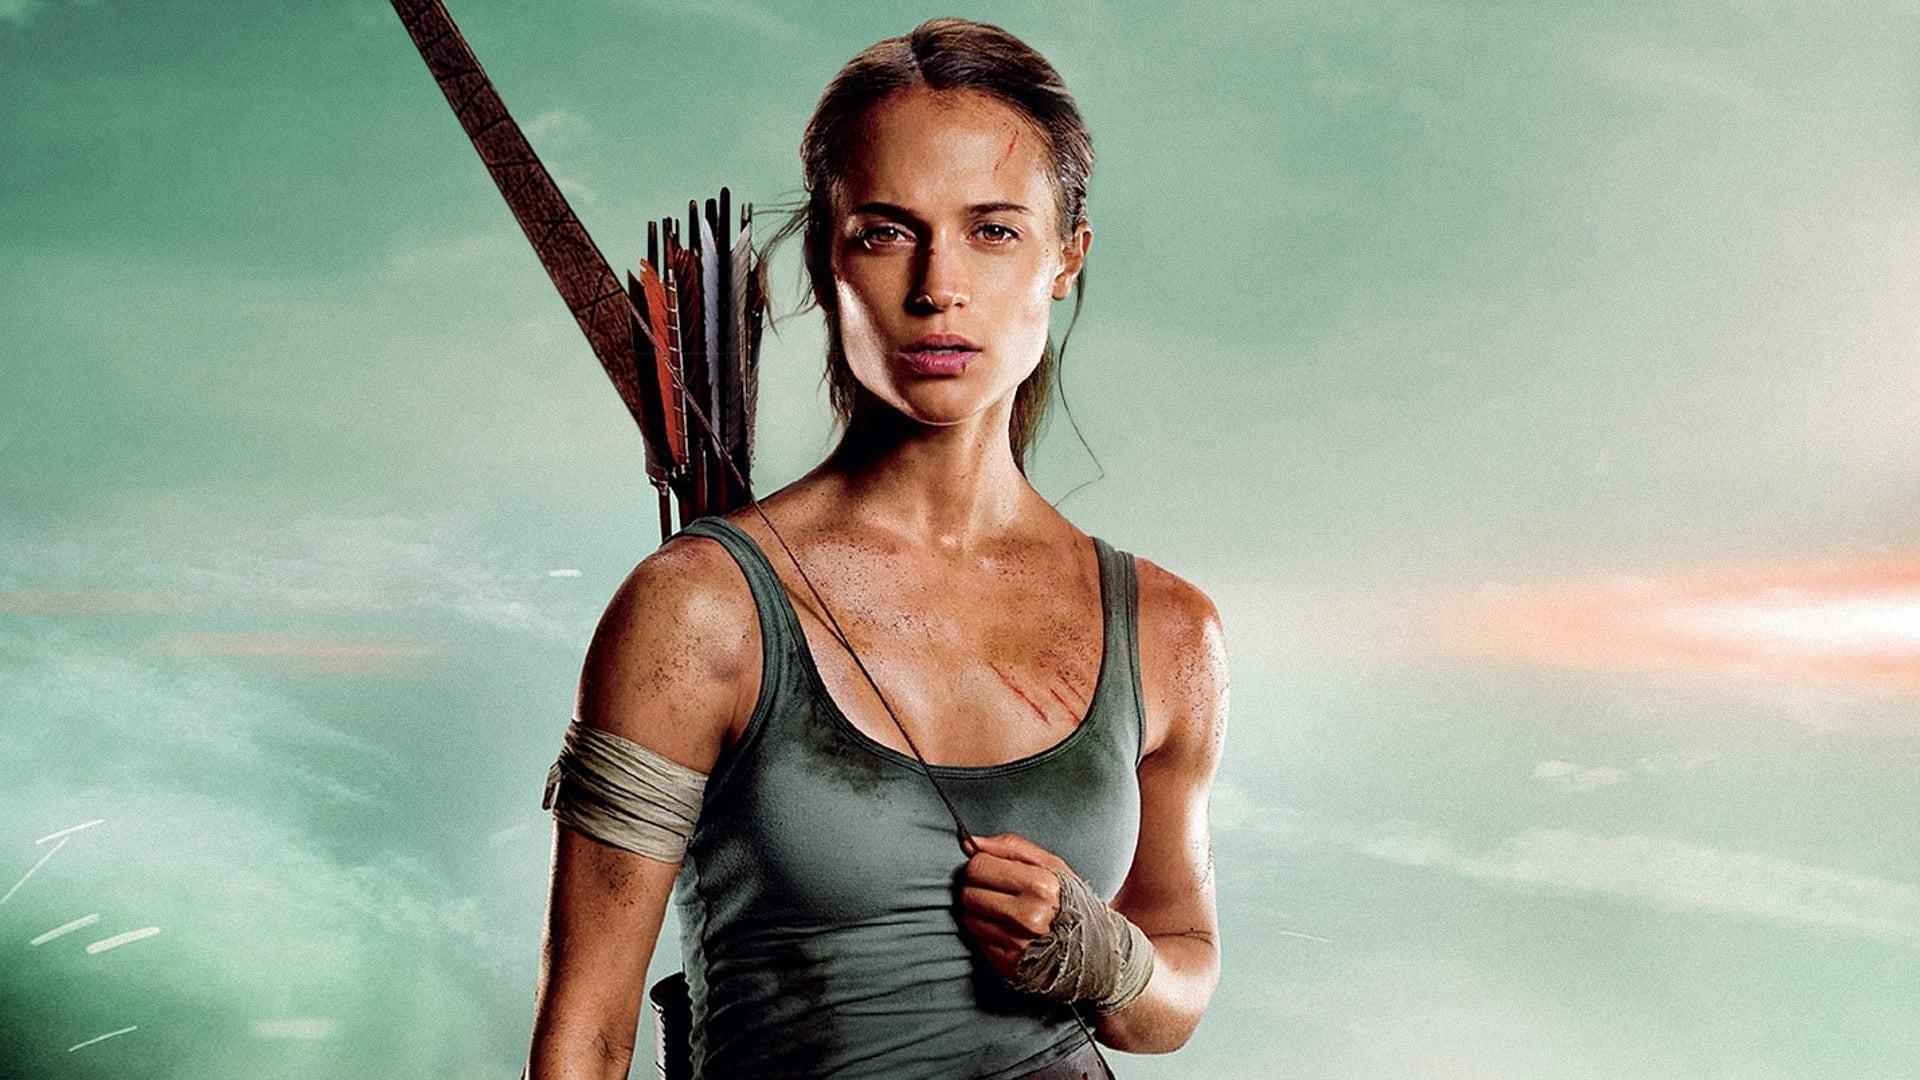 Film Tomb Raider 2 našel režiséra a má datum premiéry